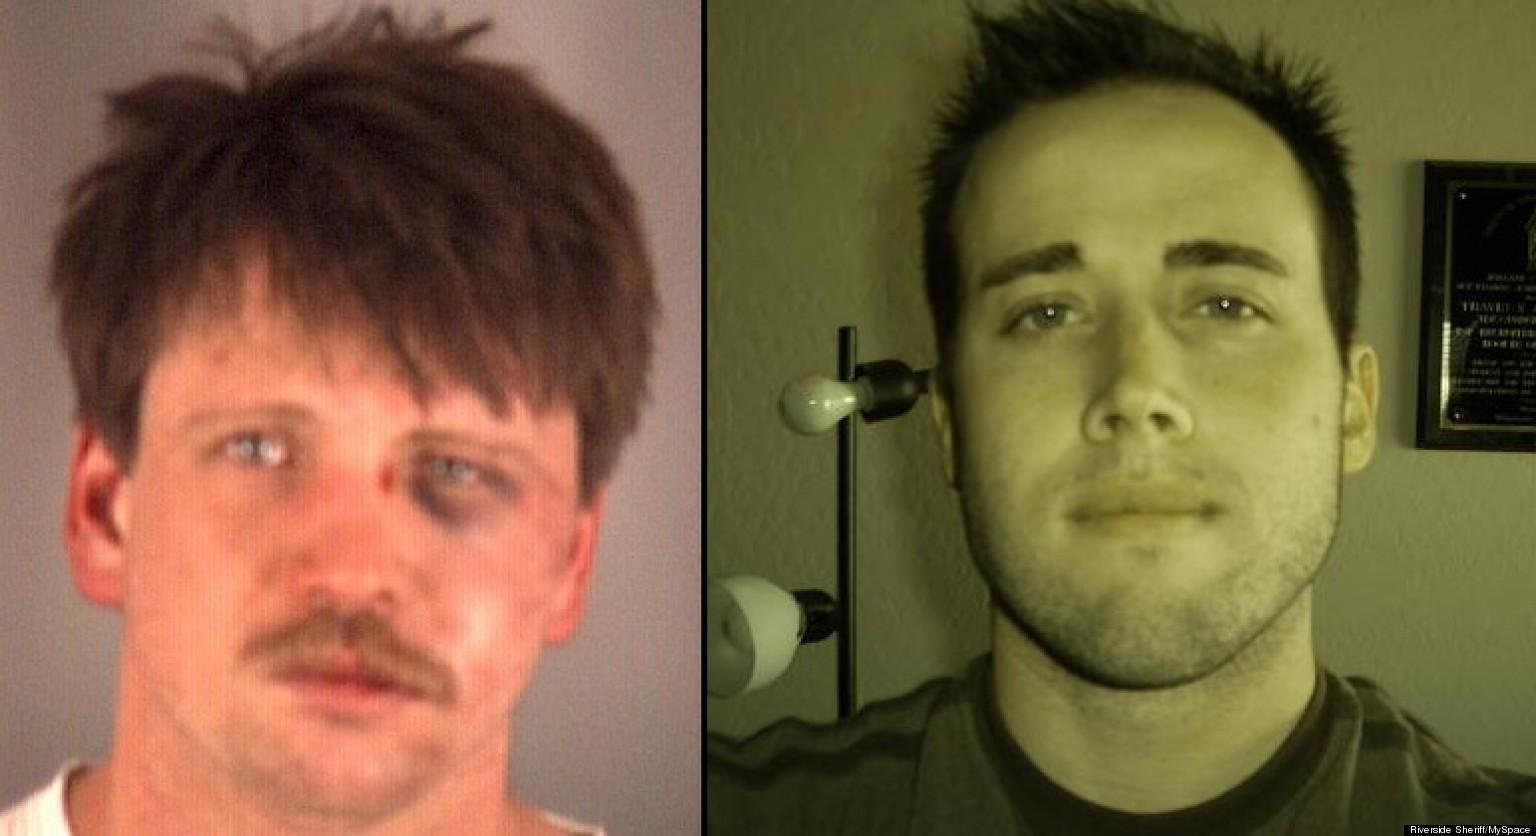 ... Crime Scene Photos Of Travis Alexander O-travis-victor-alexander